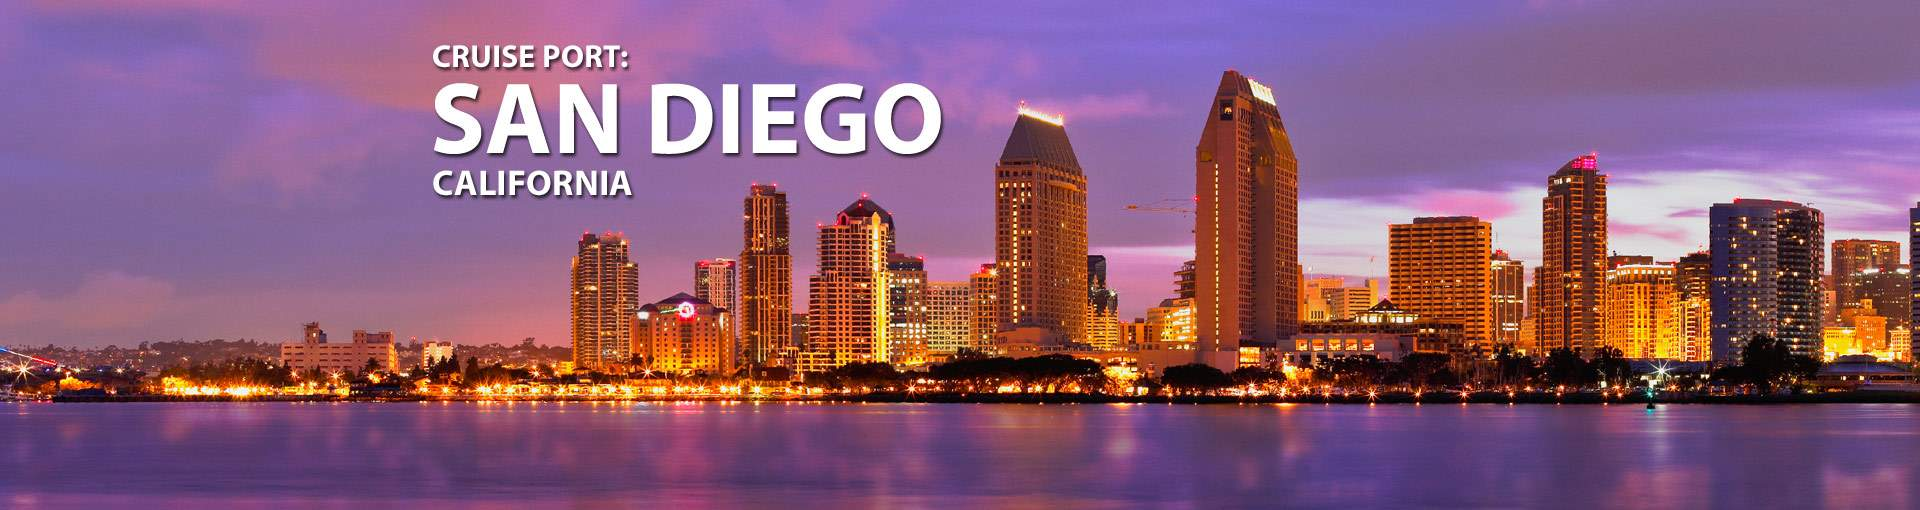 Cruise Port: San Diego, California